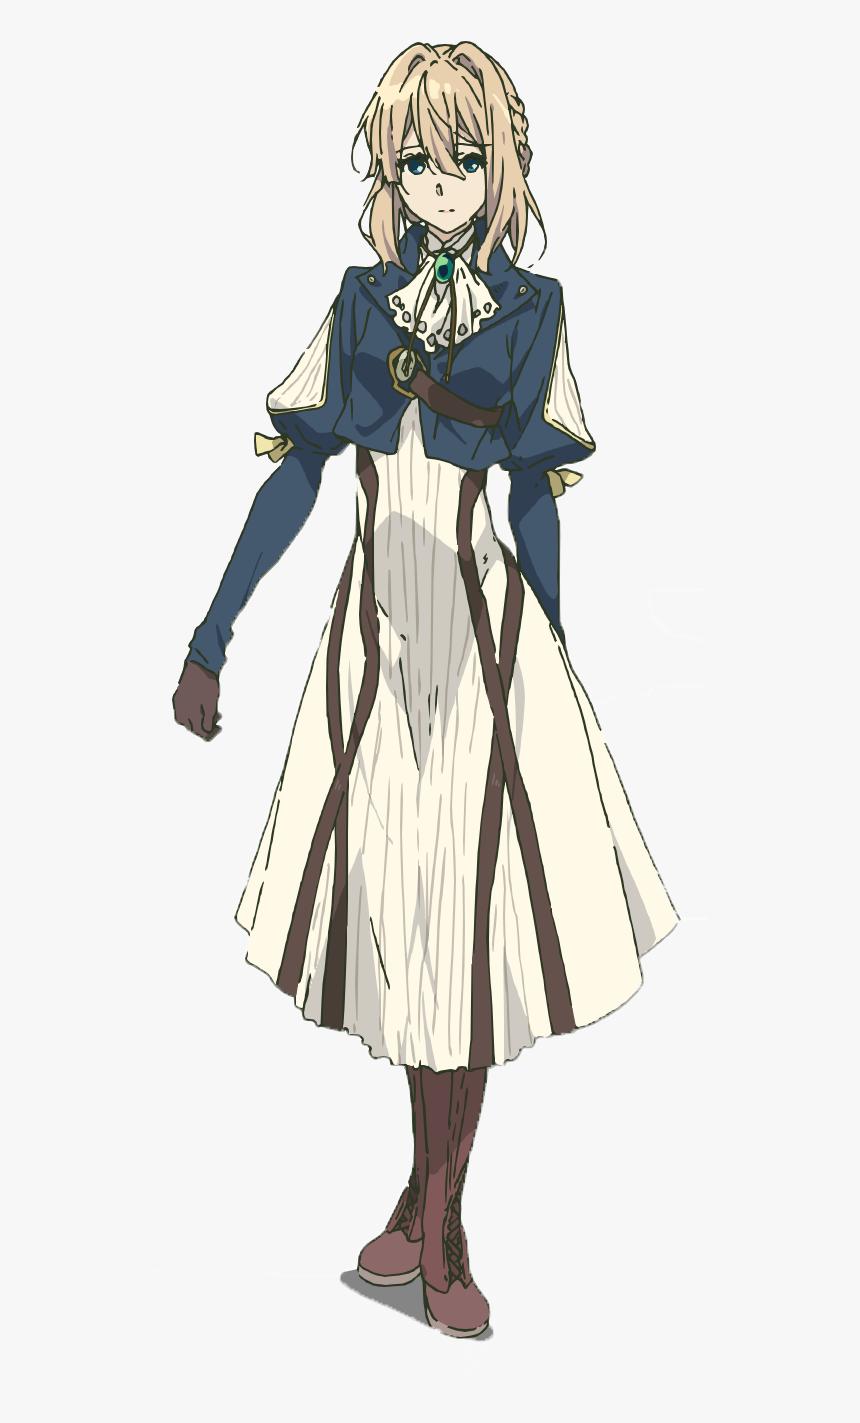 Kimetsu No Yaiba Png Image With Transparent Background Png Free Png Images Anime Character Drawing Slayer Anime Anime Demon